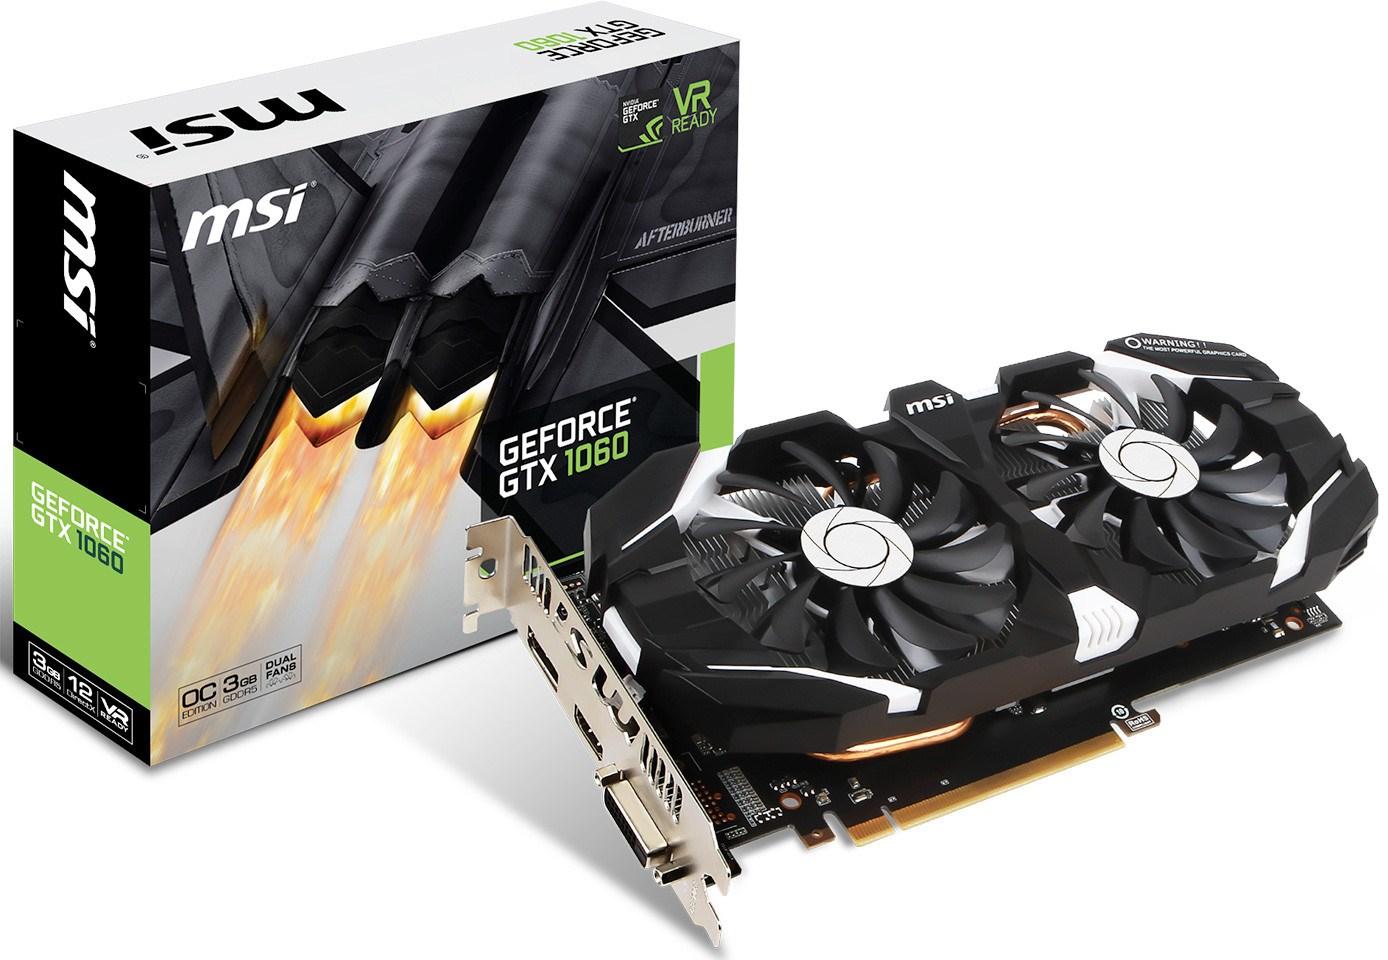 MSI GeForce GTX 1060 3GB Graphics Card - GEFORCE GTX 1060 3GT OC